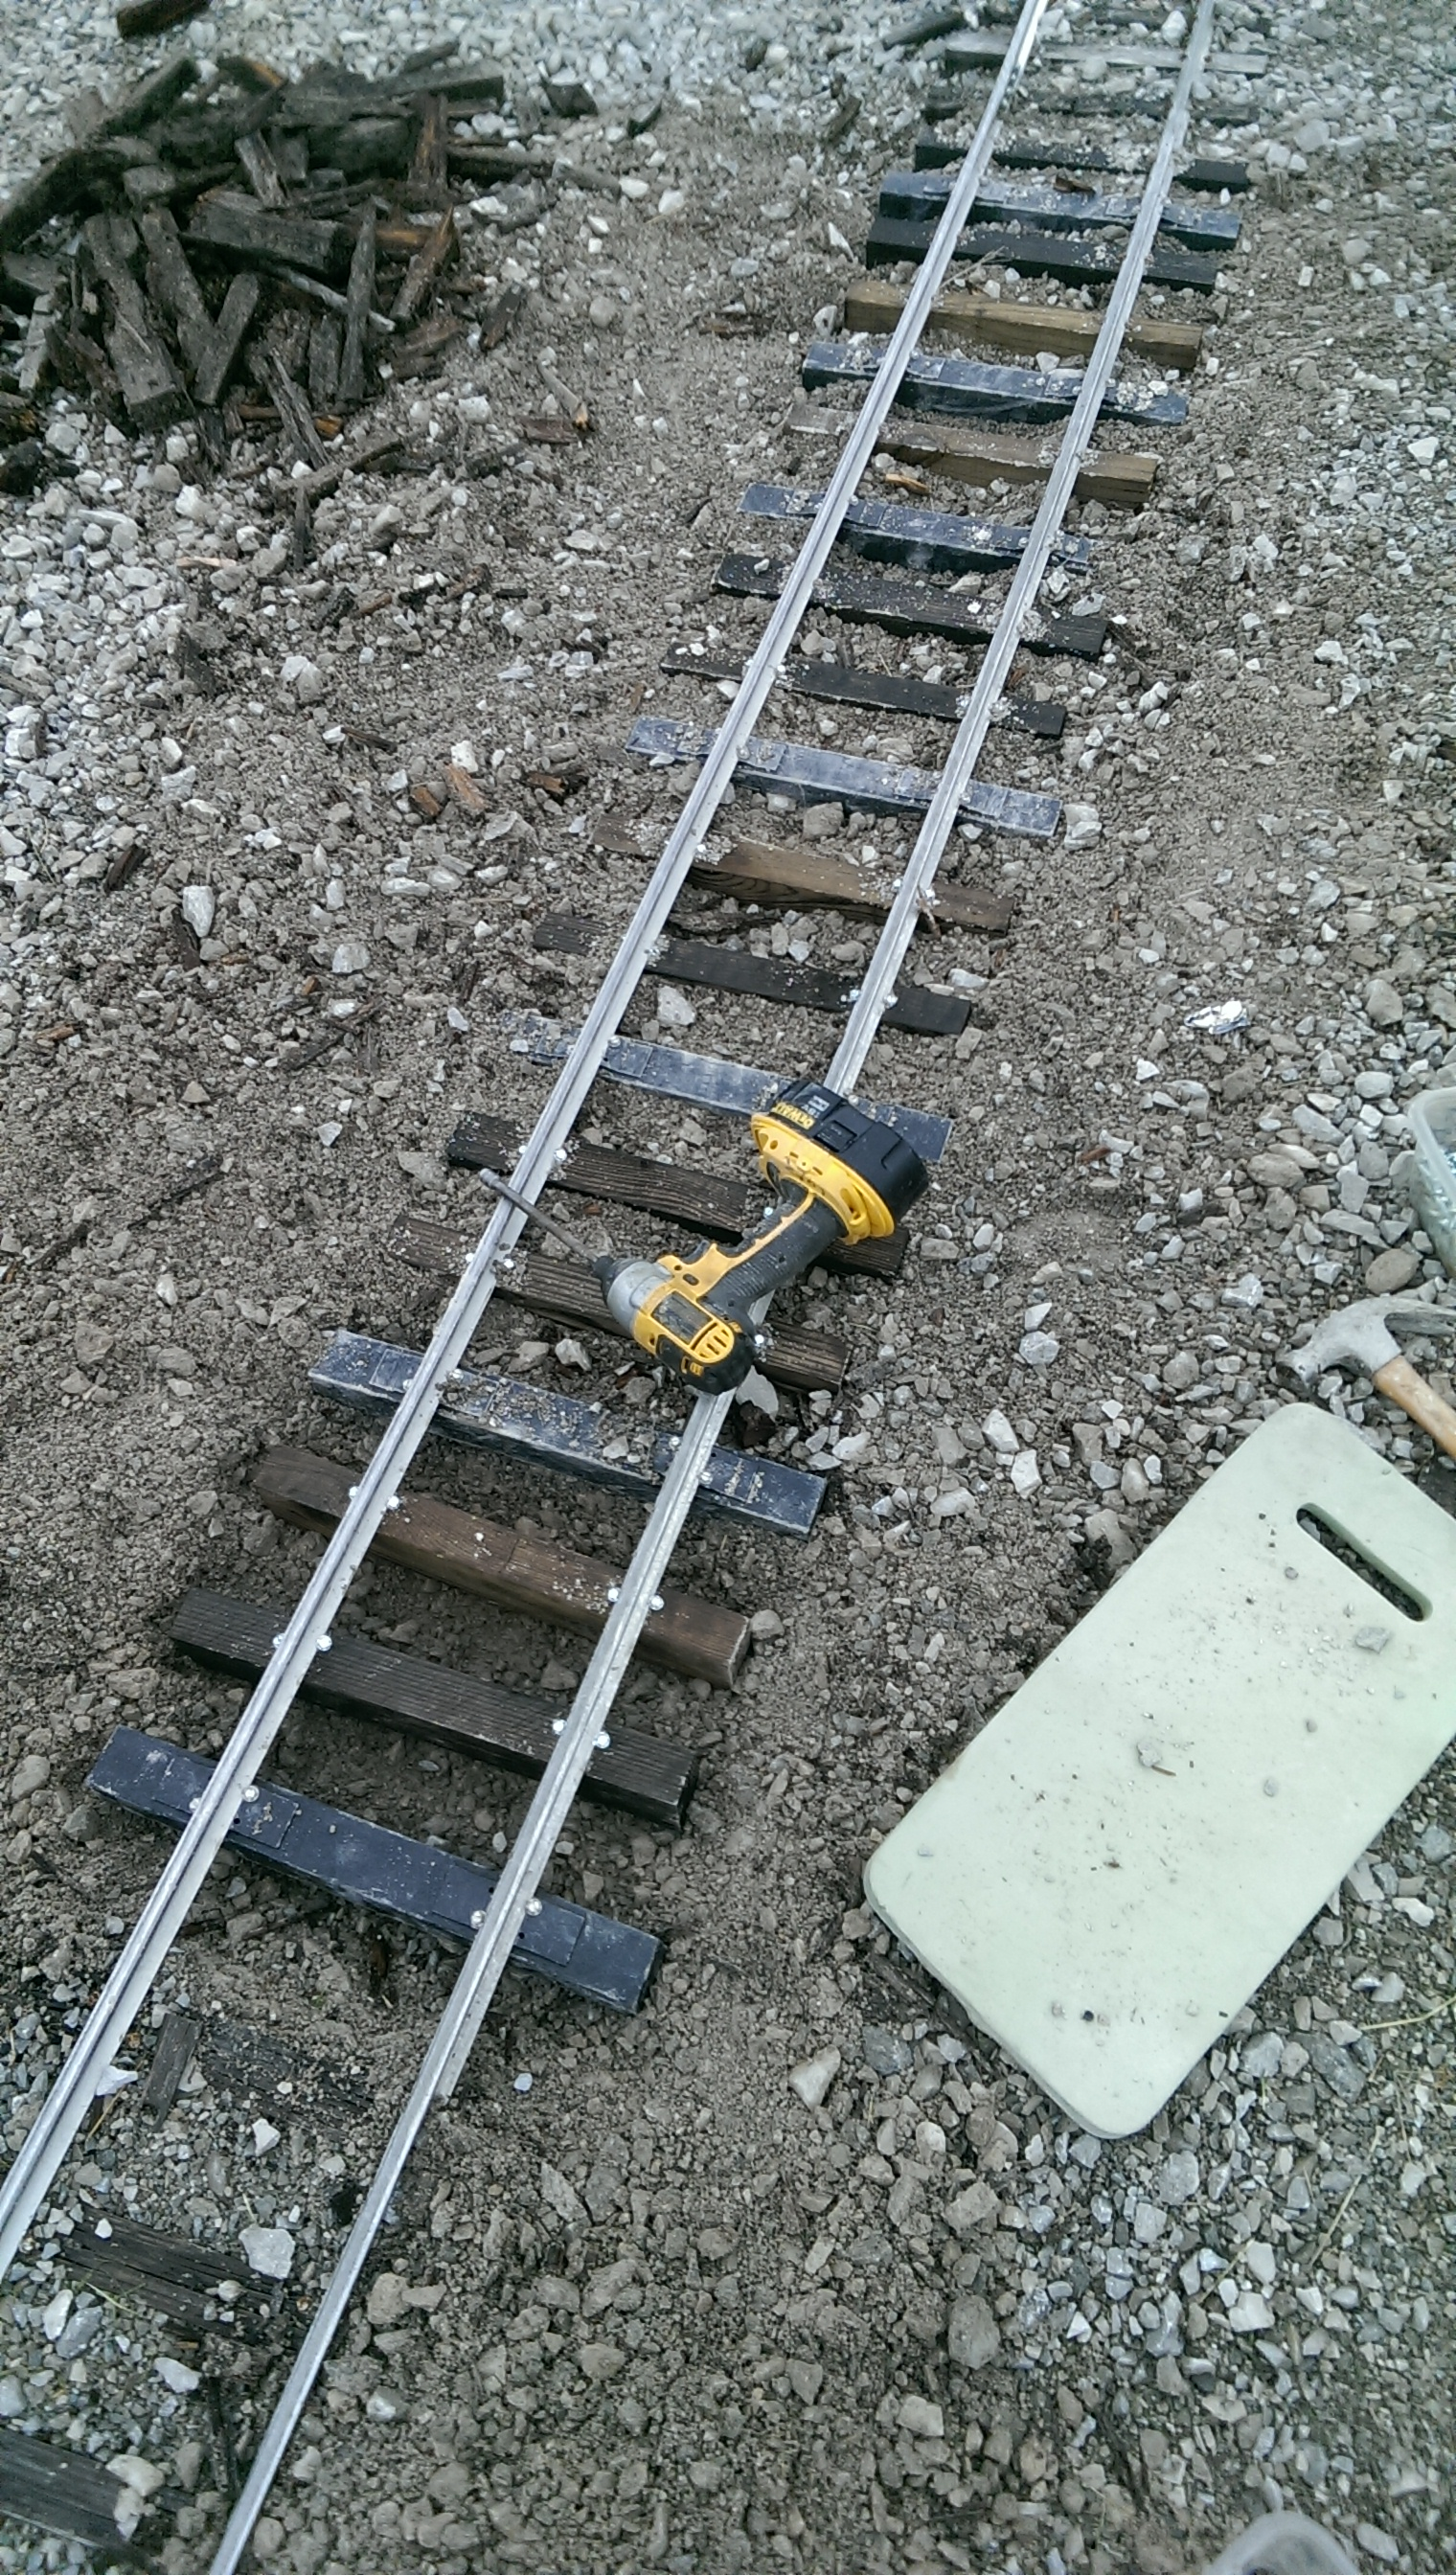 Upper Loop track (From Triple Bridge going toward High Bridge)getting some new plastic and wood ties. Photo Taken during repairs.